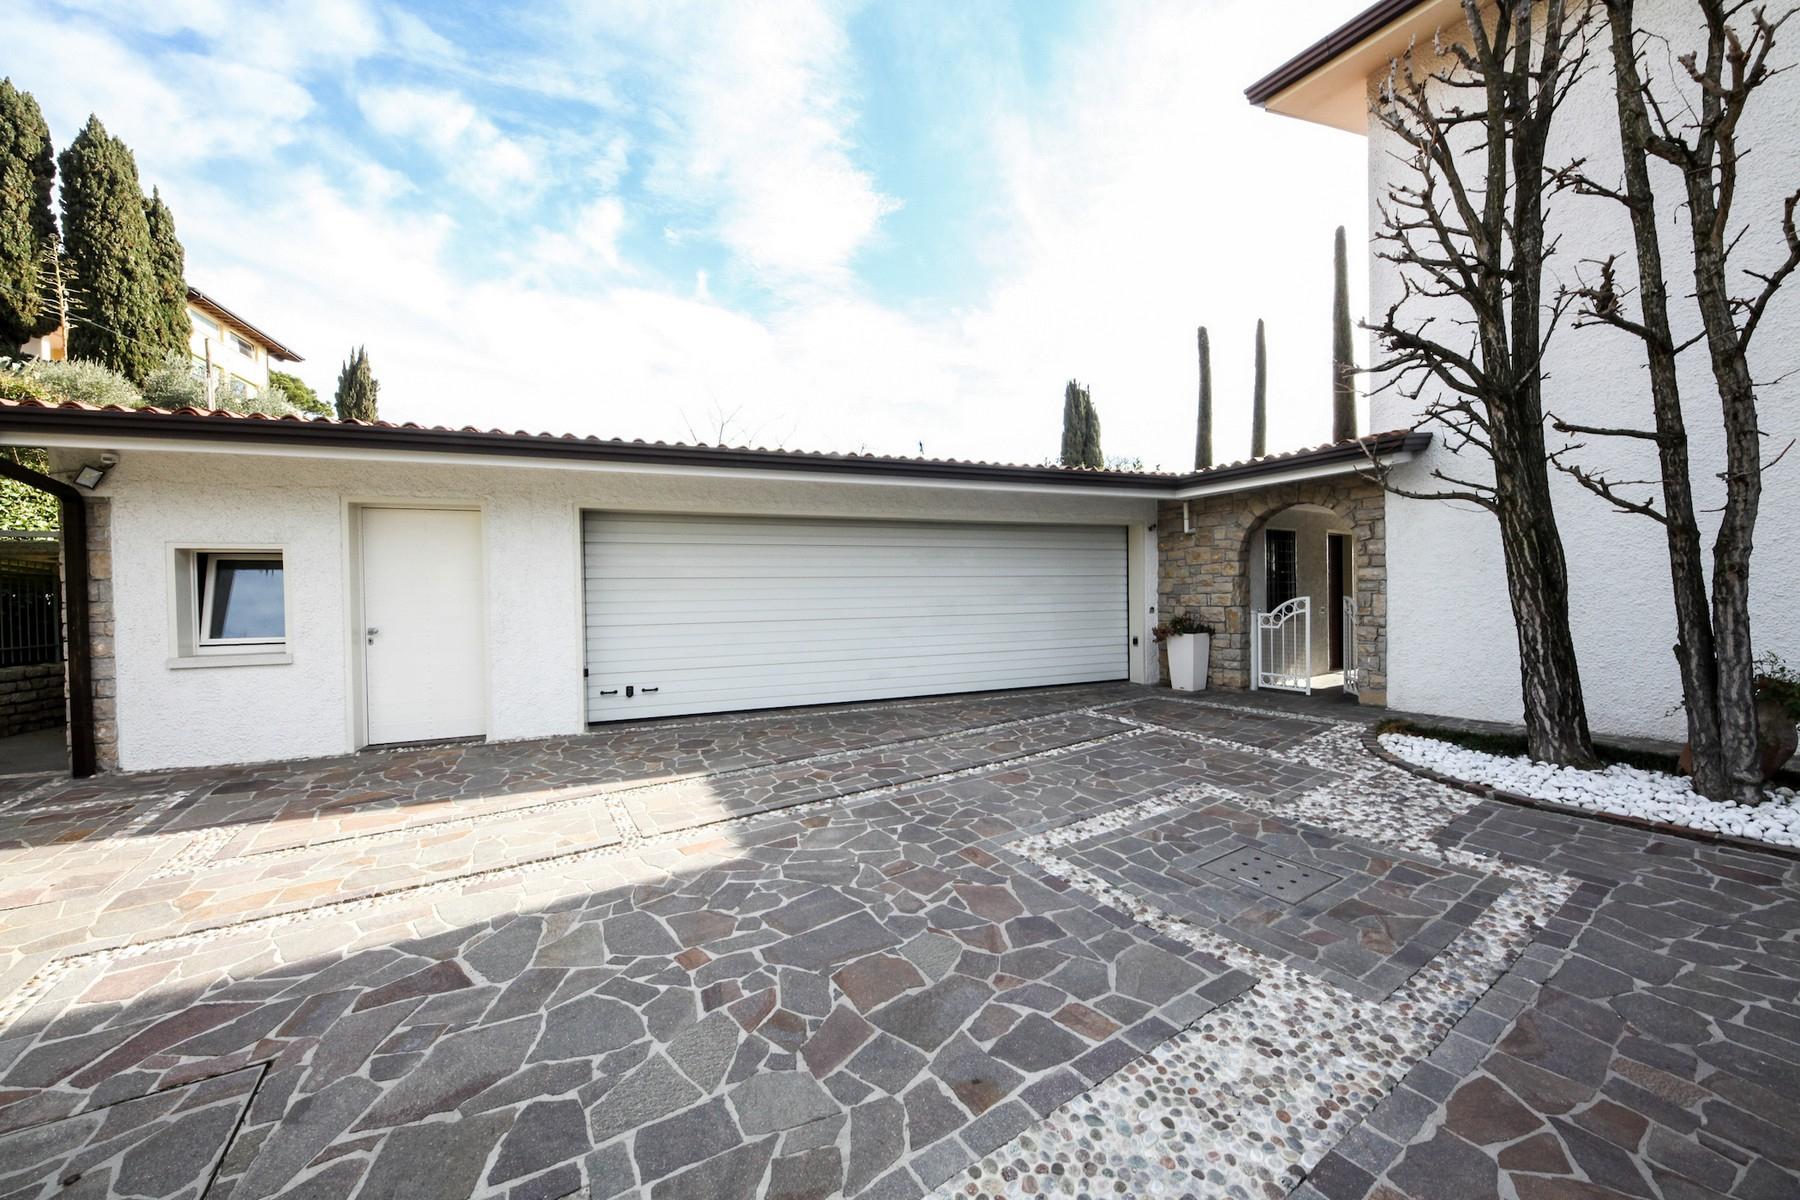 Villa in Vendita a Padenghe Sul Garda: 5 locali, 330 mq - Foto 28